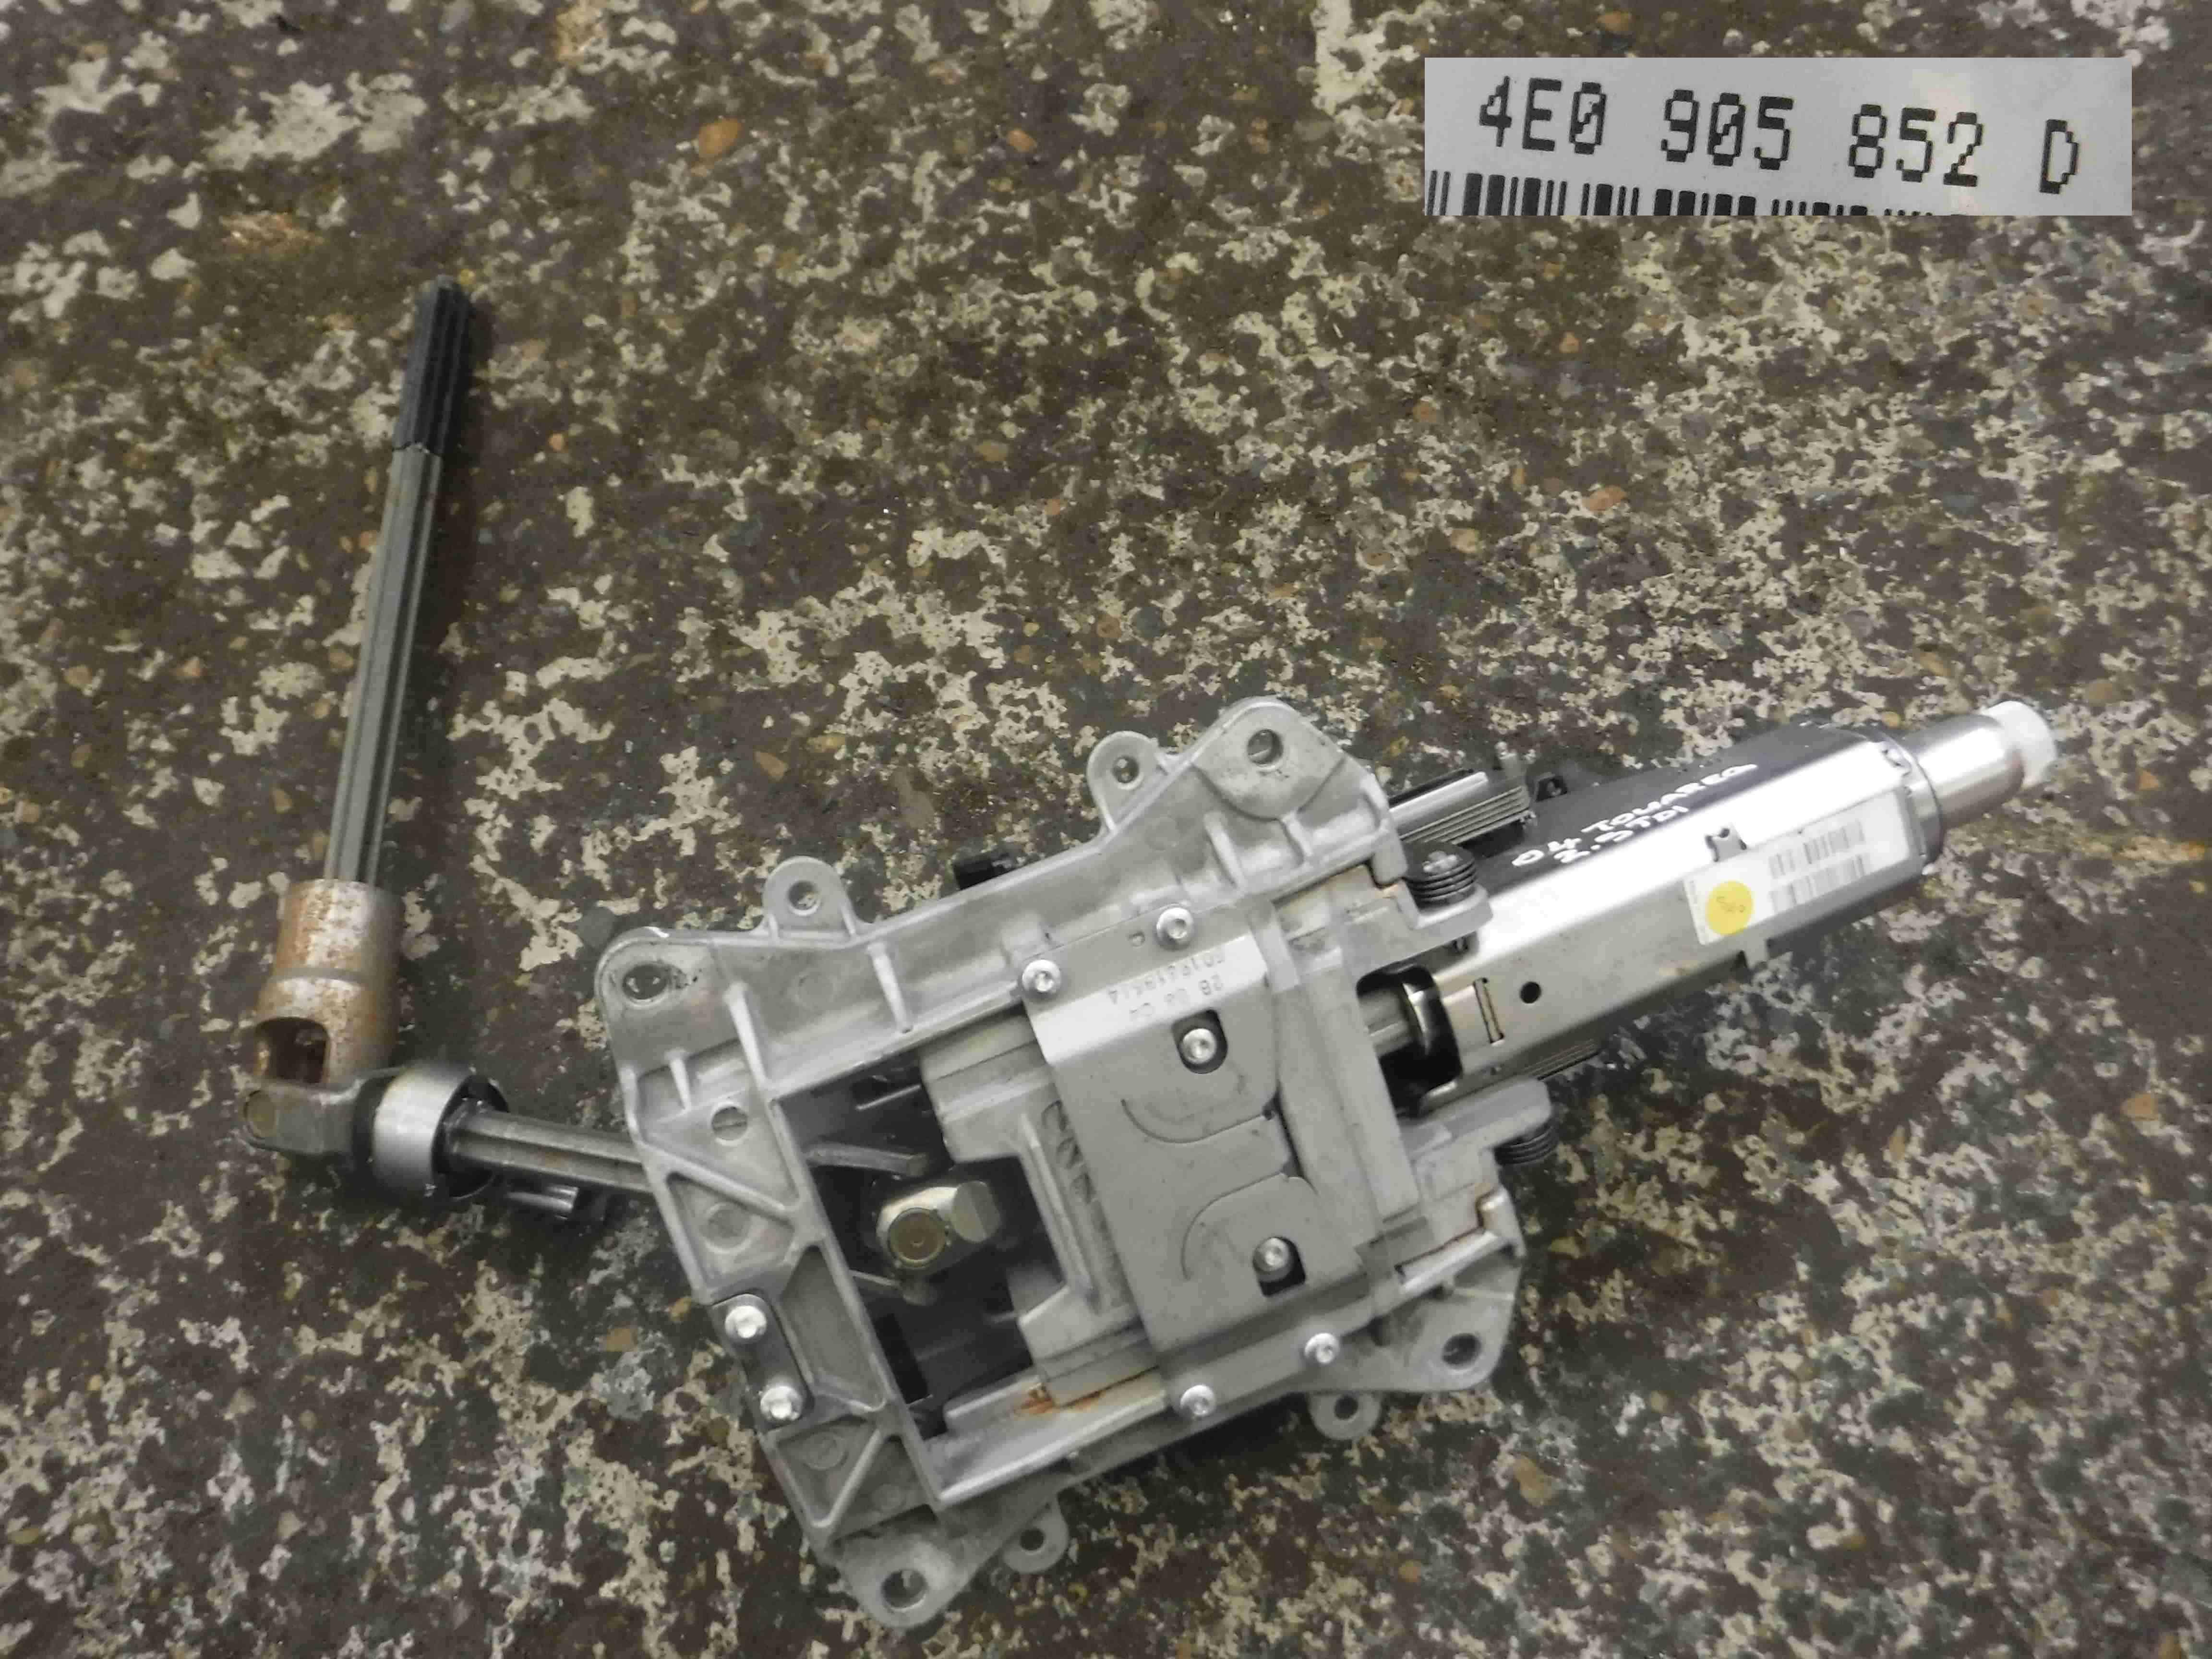 Volkswgaen Touareg 2002-2007 Power Steering Column 4E0905852D